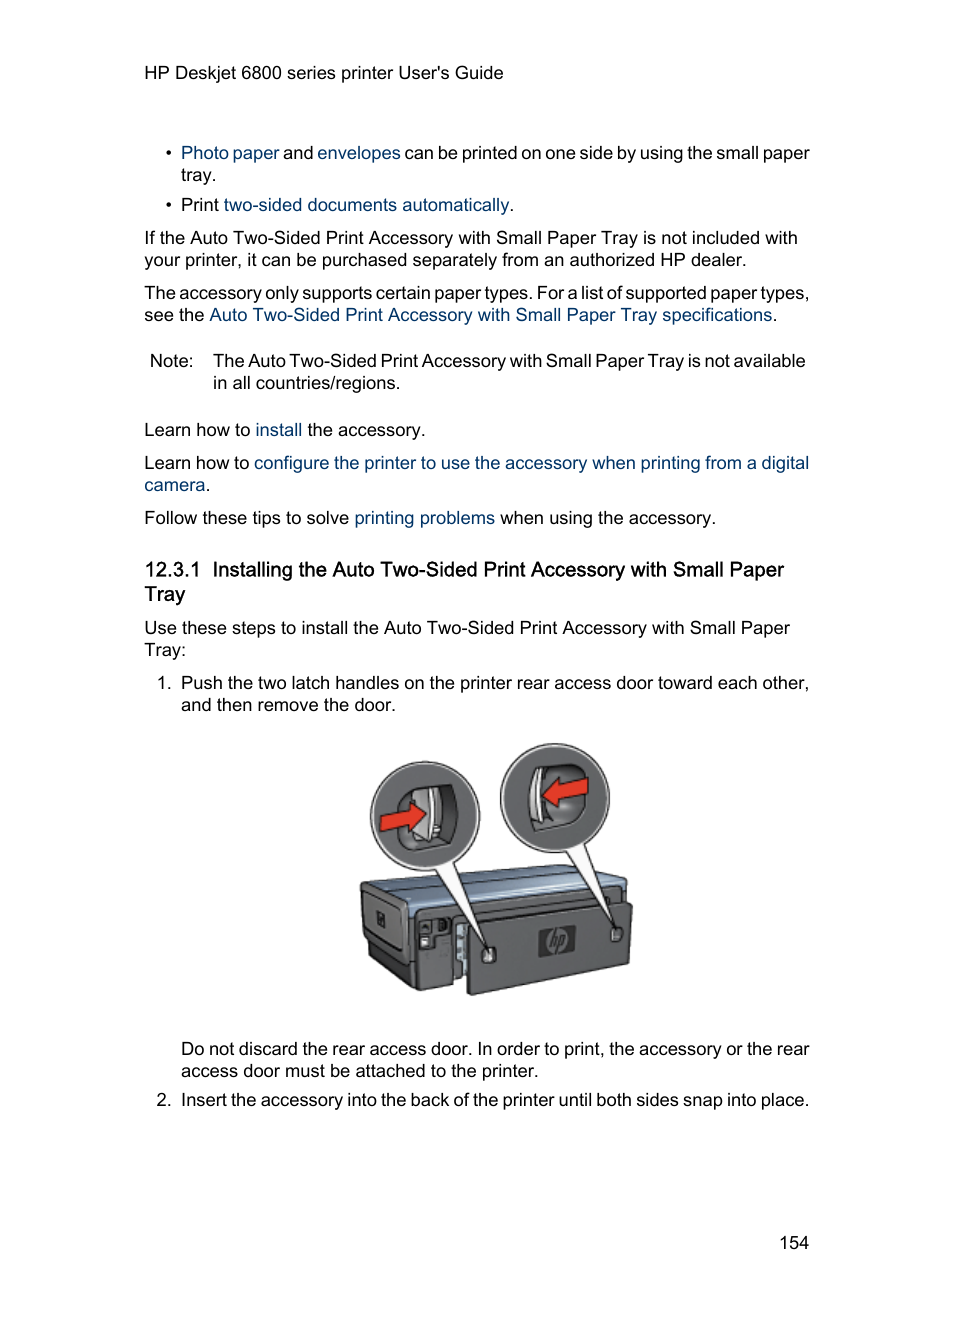 HP Deskjet 6840 Color Inkjet Printer User Manual   Page 154 / 176